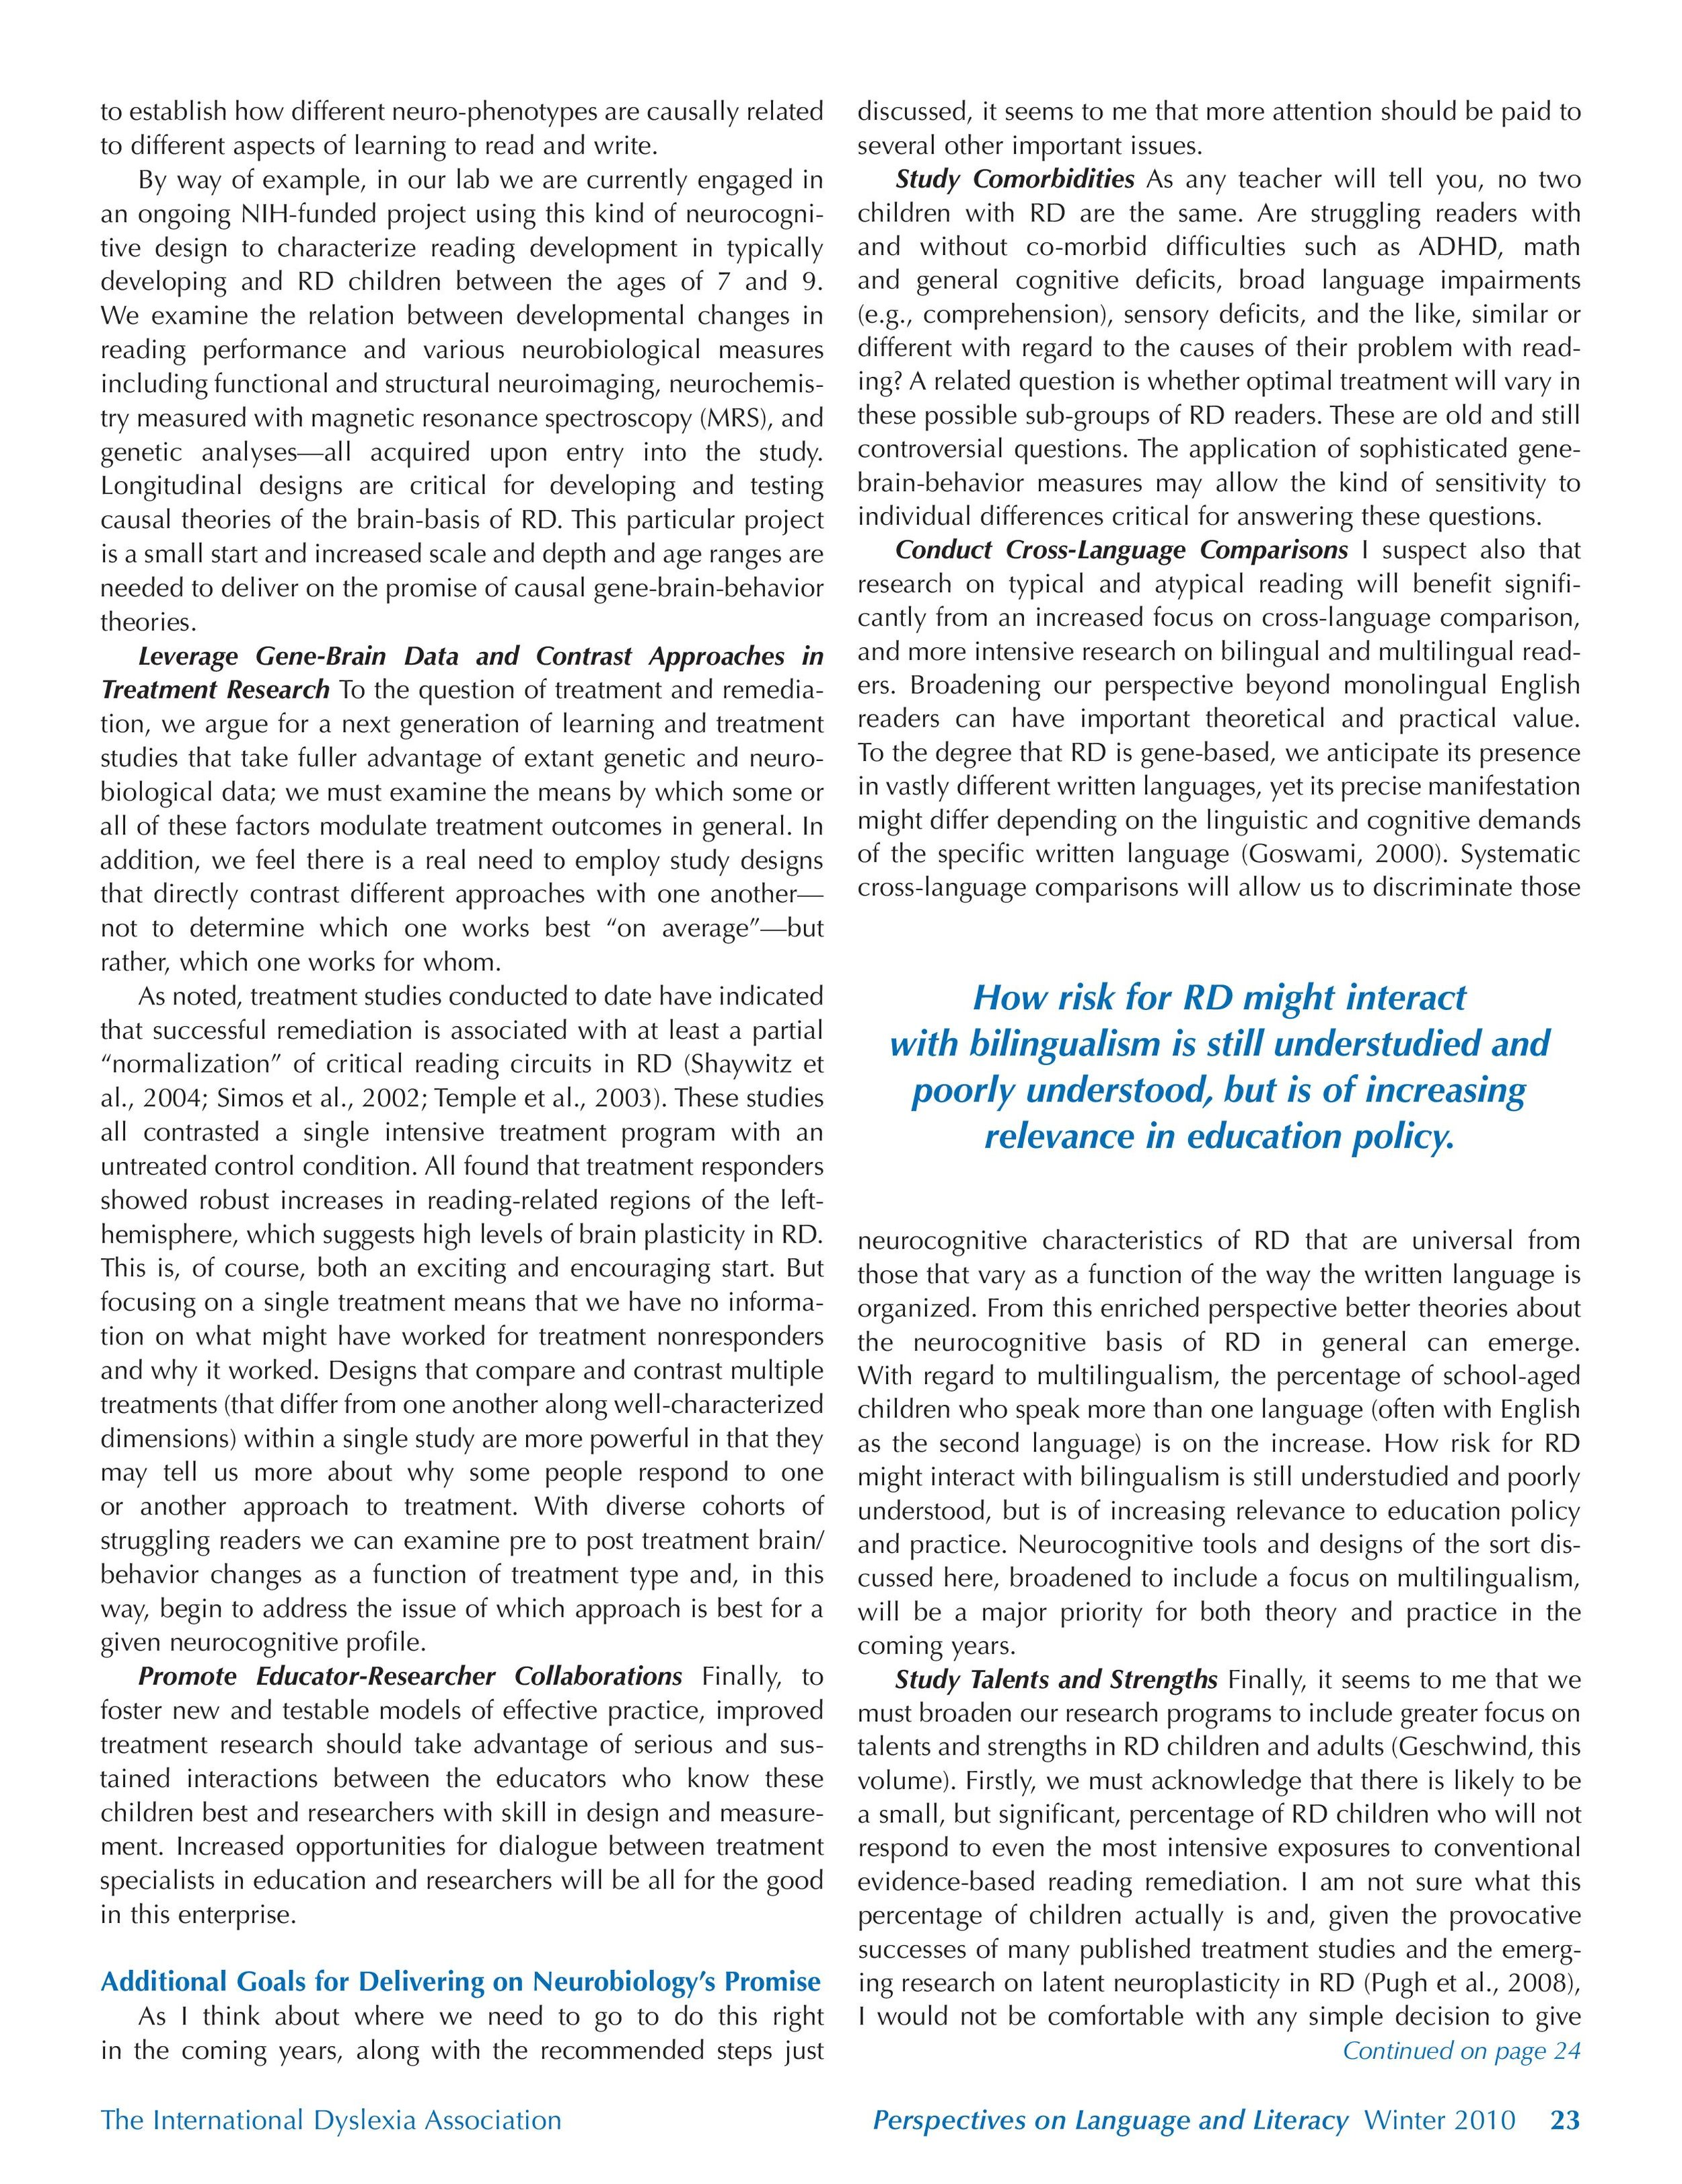 Pugh IDA perspectives (1)-page-002.jpg